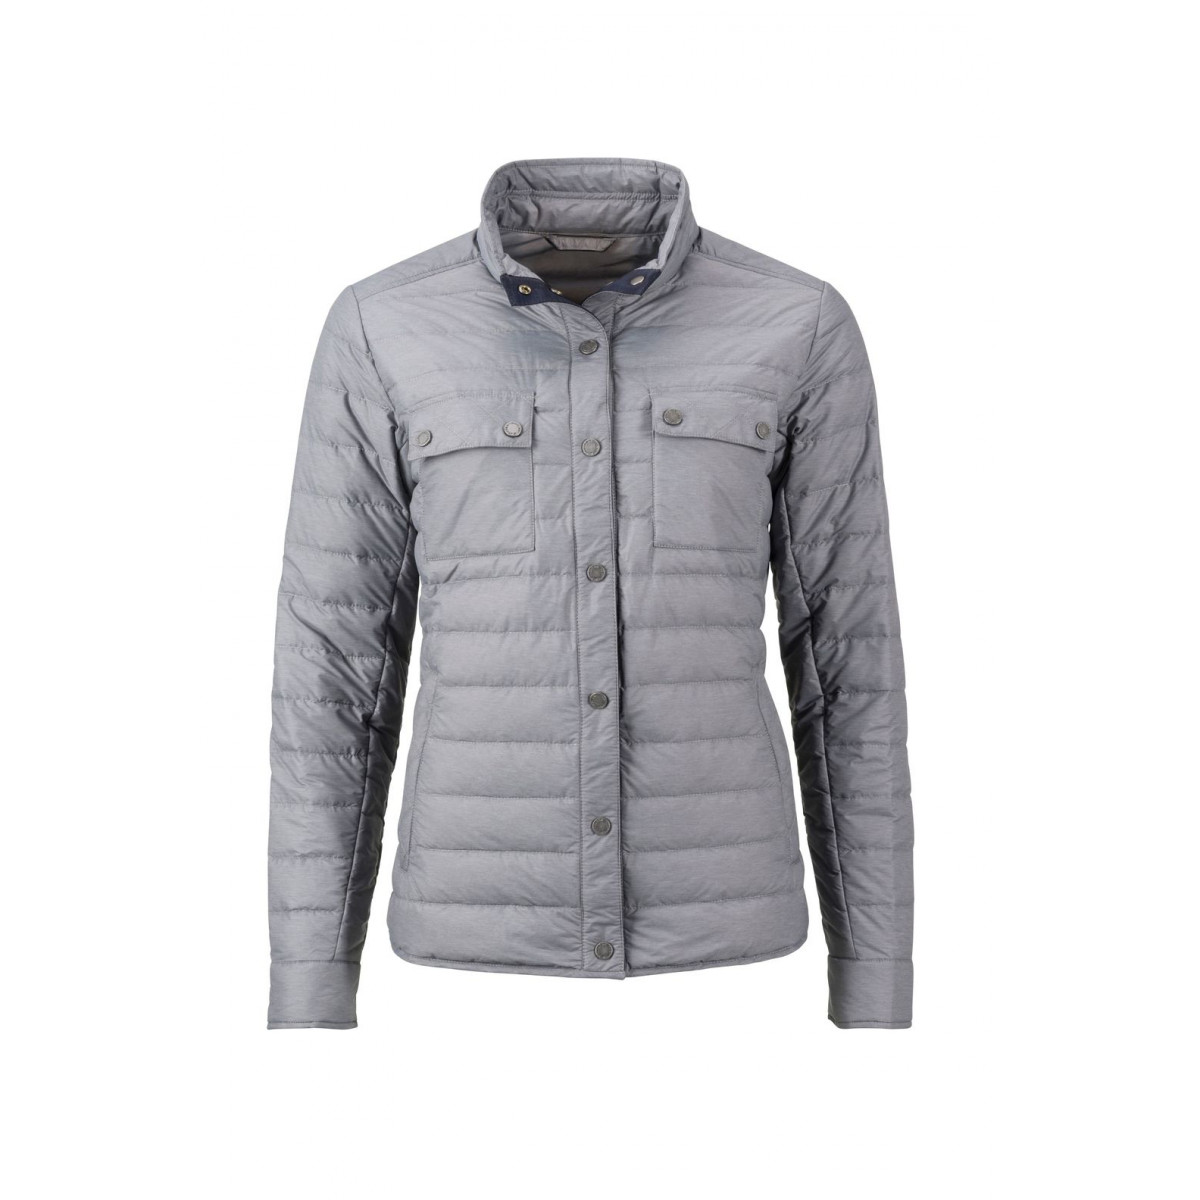 Куртка женская JN1105 Ladies Lightweight Down Jacket - Светло-серый меланж